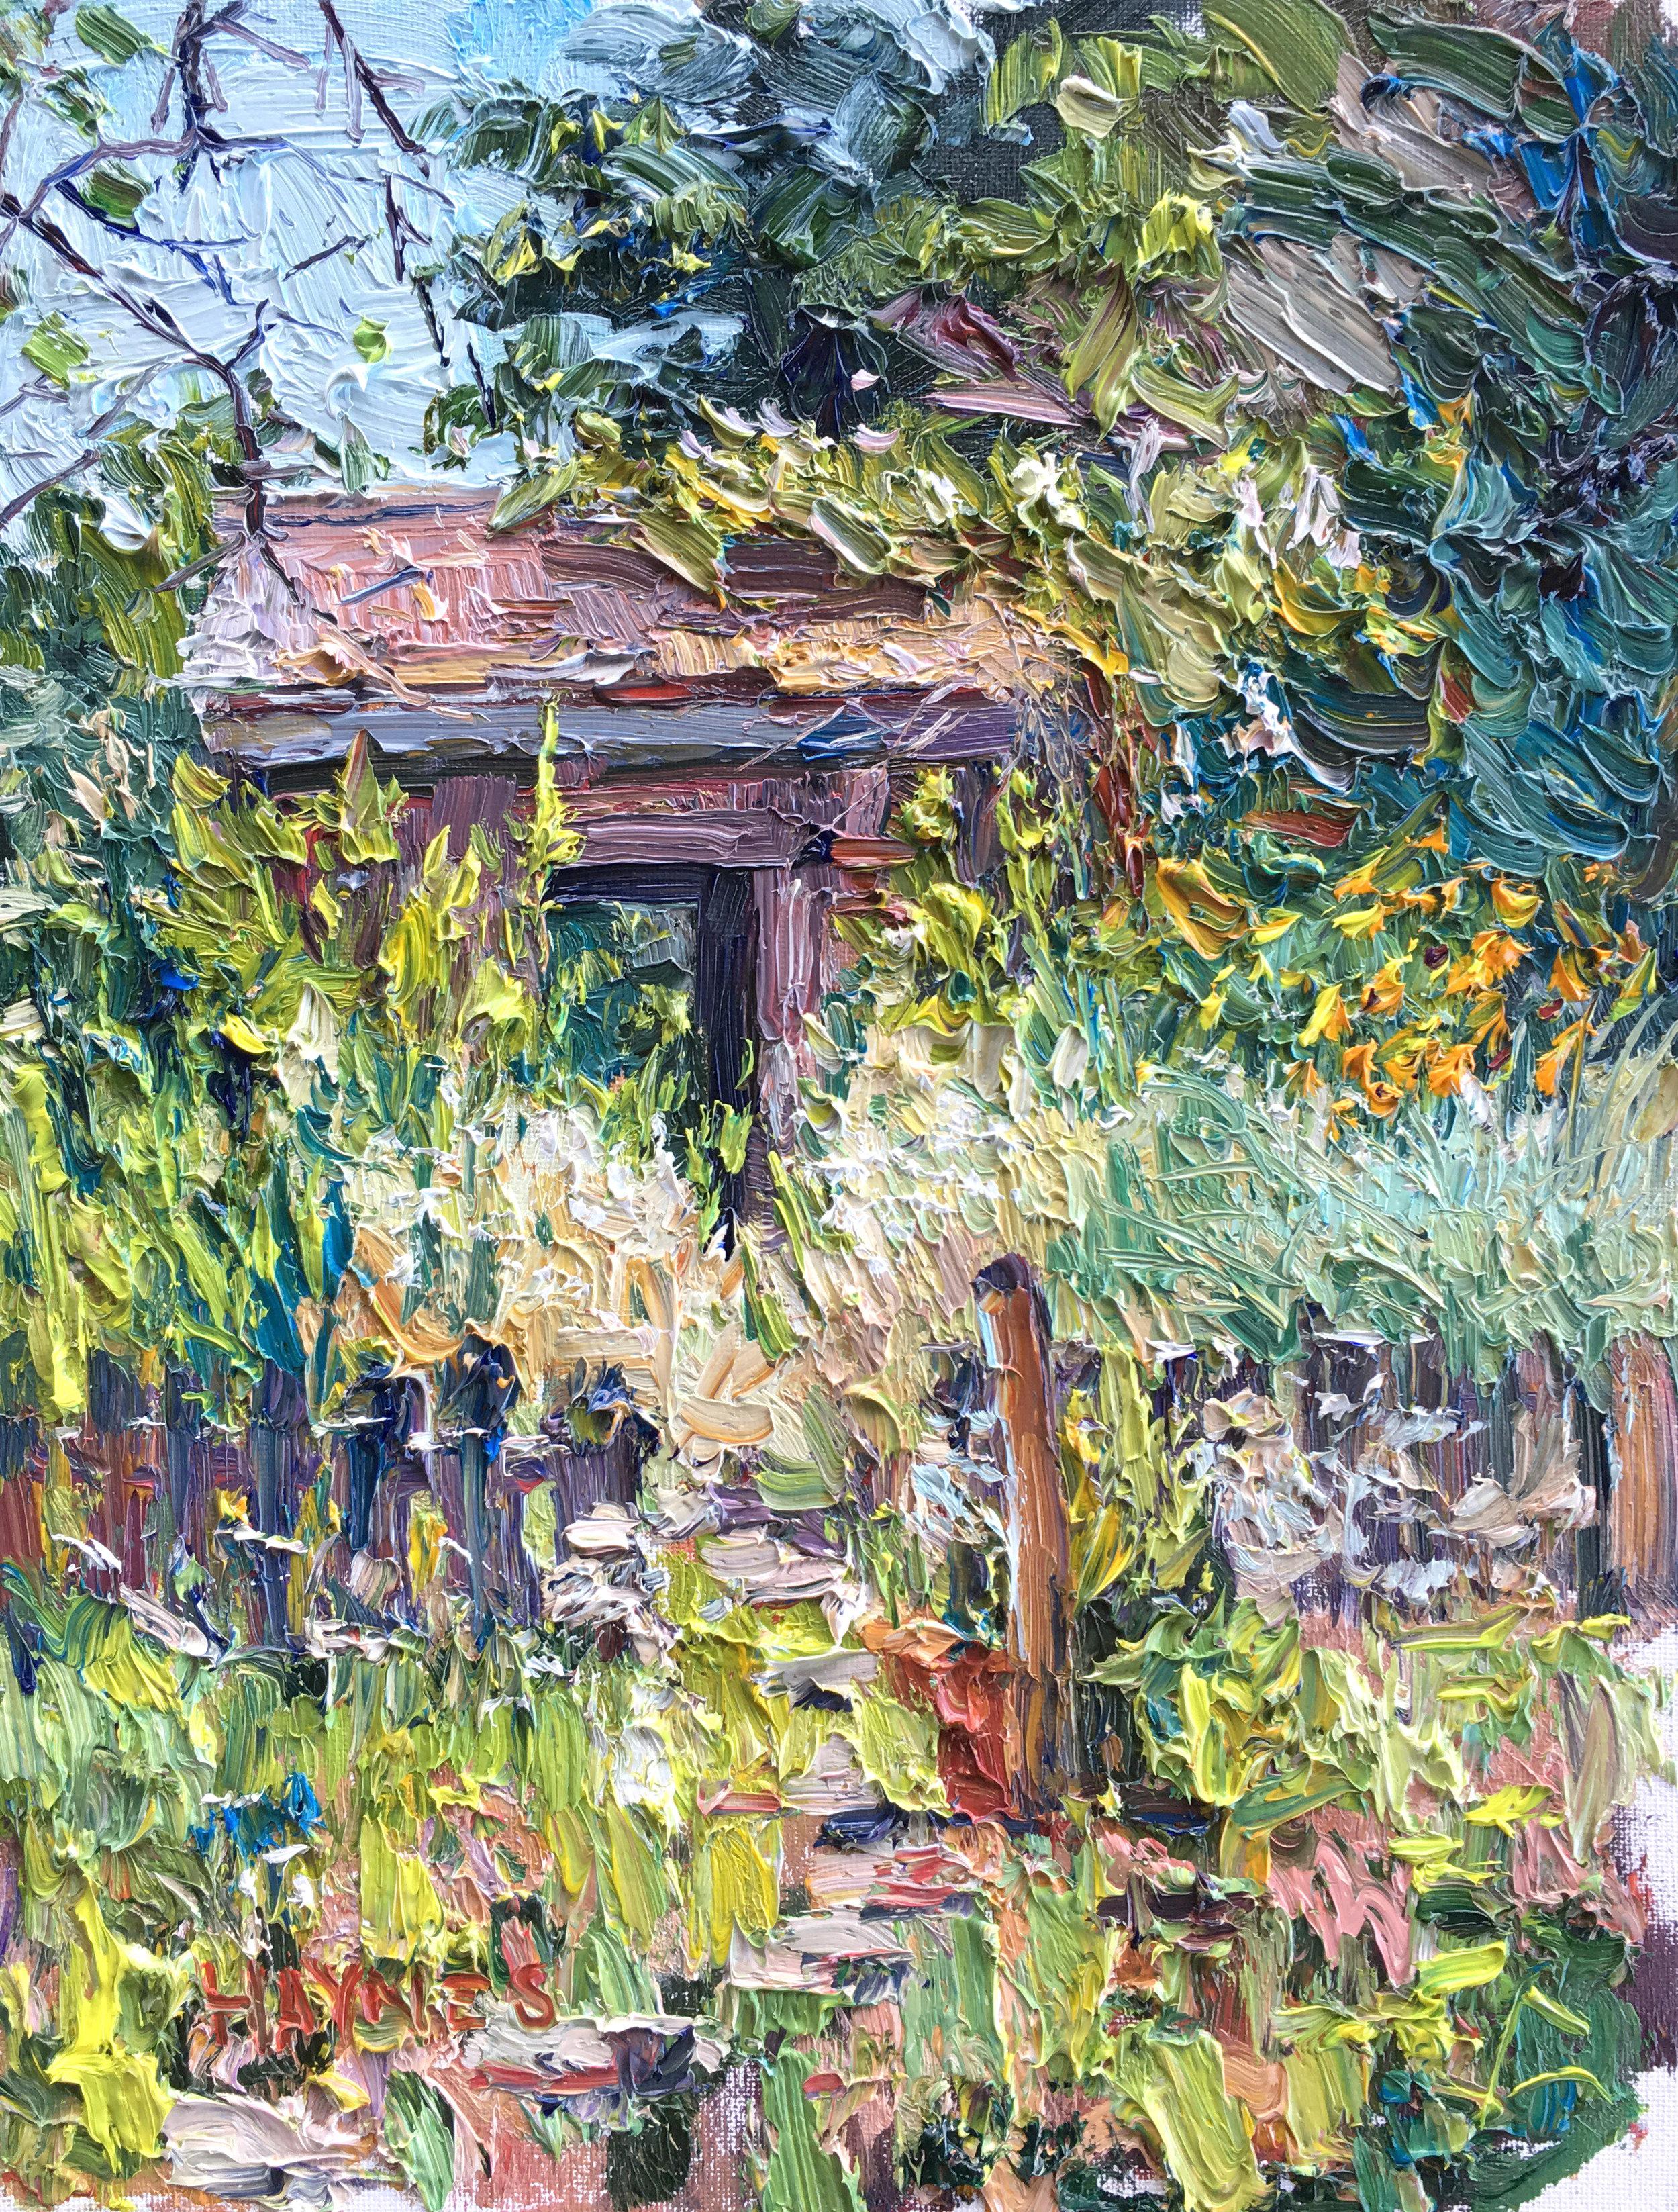 Settler's Cabin 11x14, Oil on Canvas.jpg